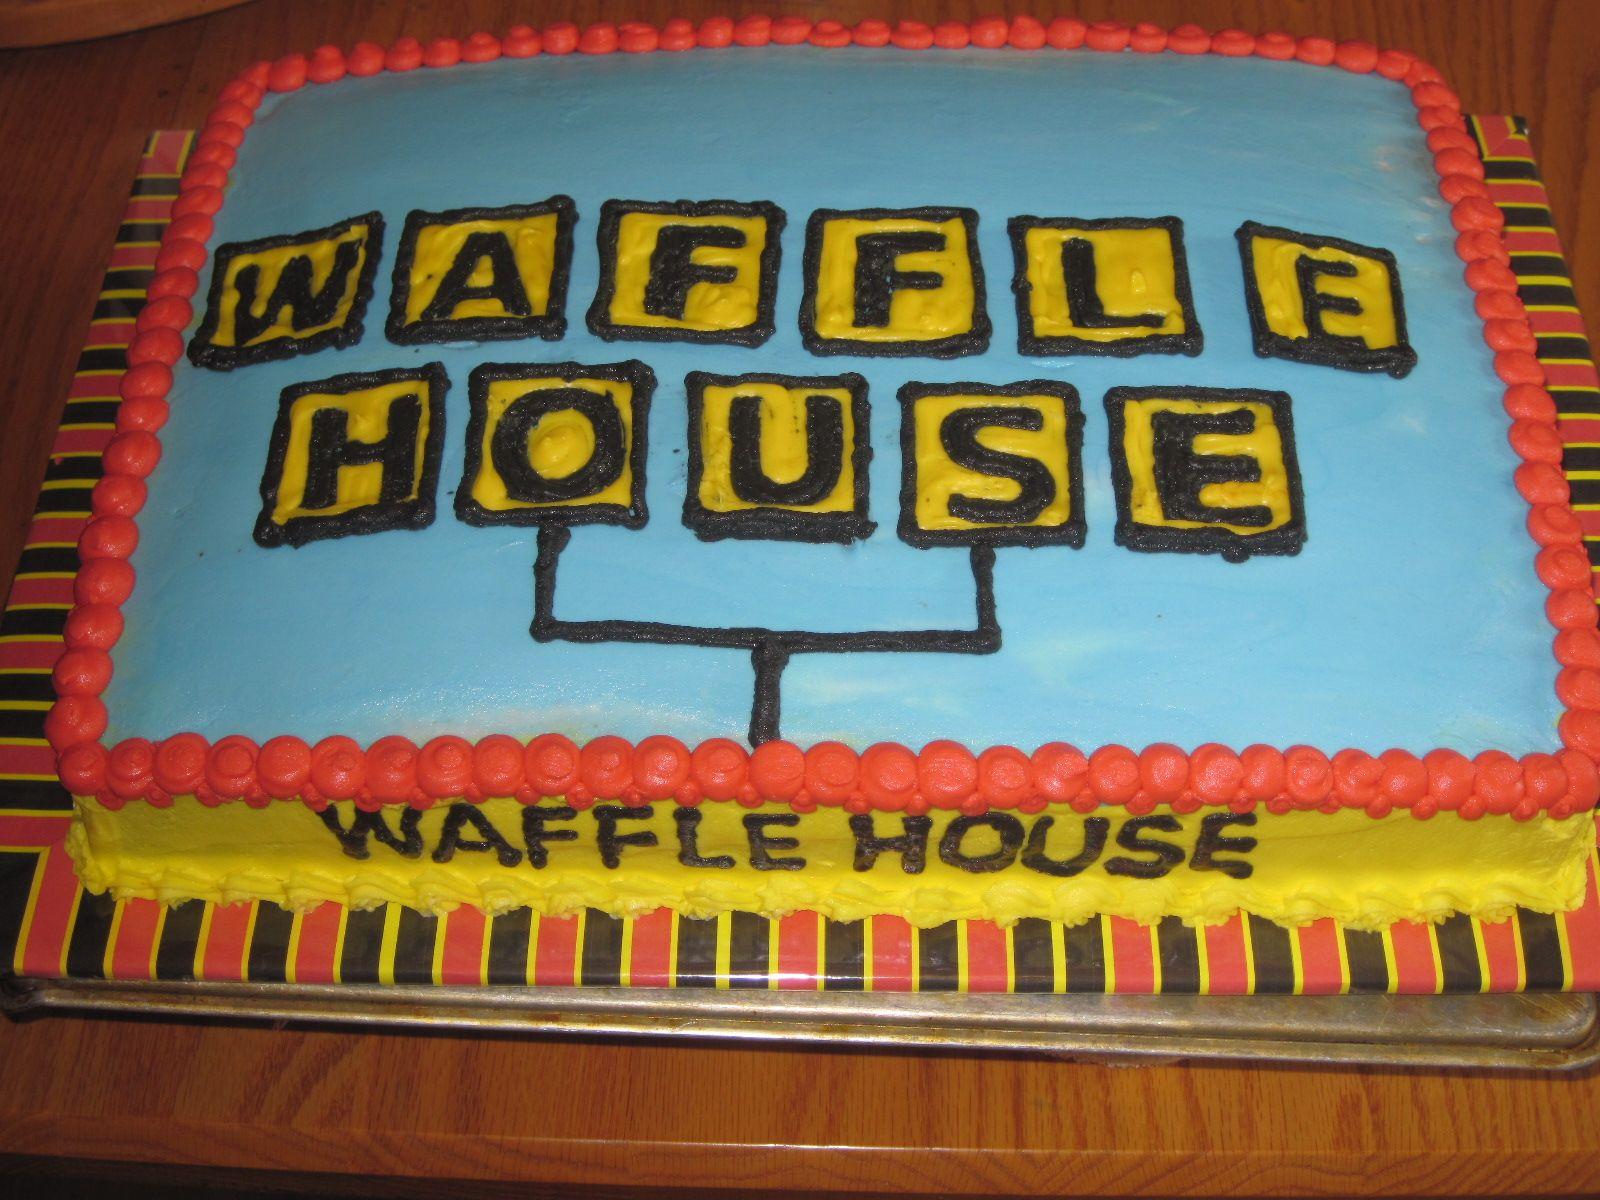 Good ole Waffle House love to eat at Waffle House